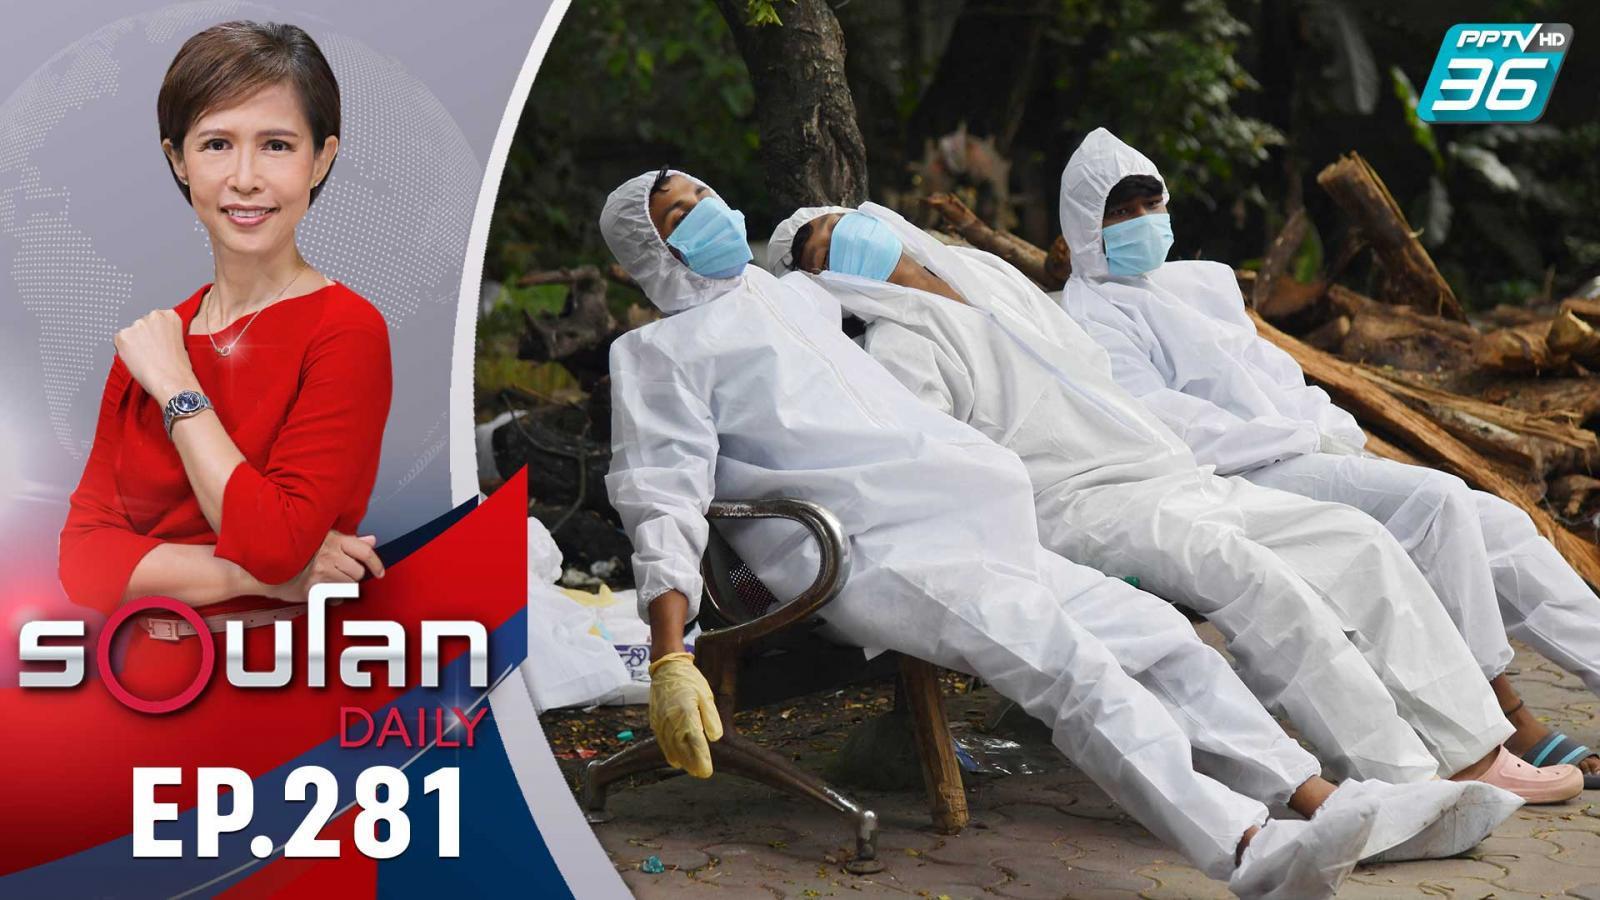 WHO เตือนวิกฤตโควิด-19 ห่างไกลจุดจบเพราะไวรัสกลายพันธุ์ | 16 ก.ค. 64 | รอบโลก DAILY